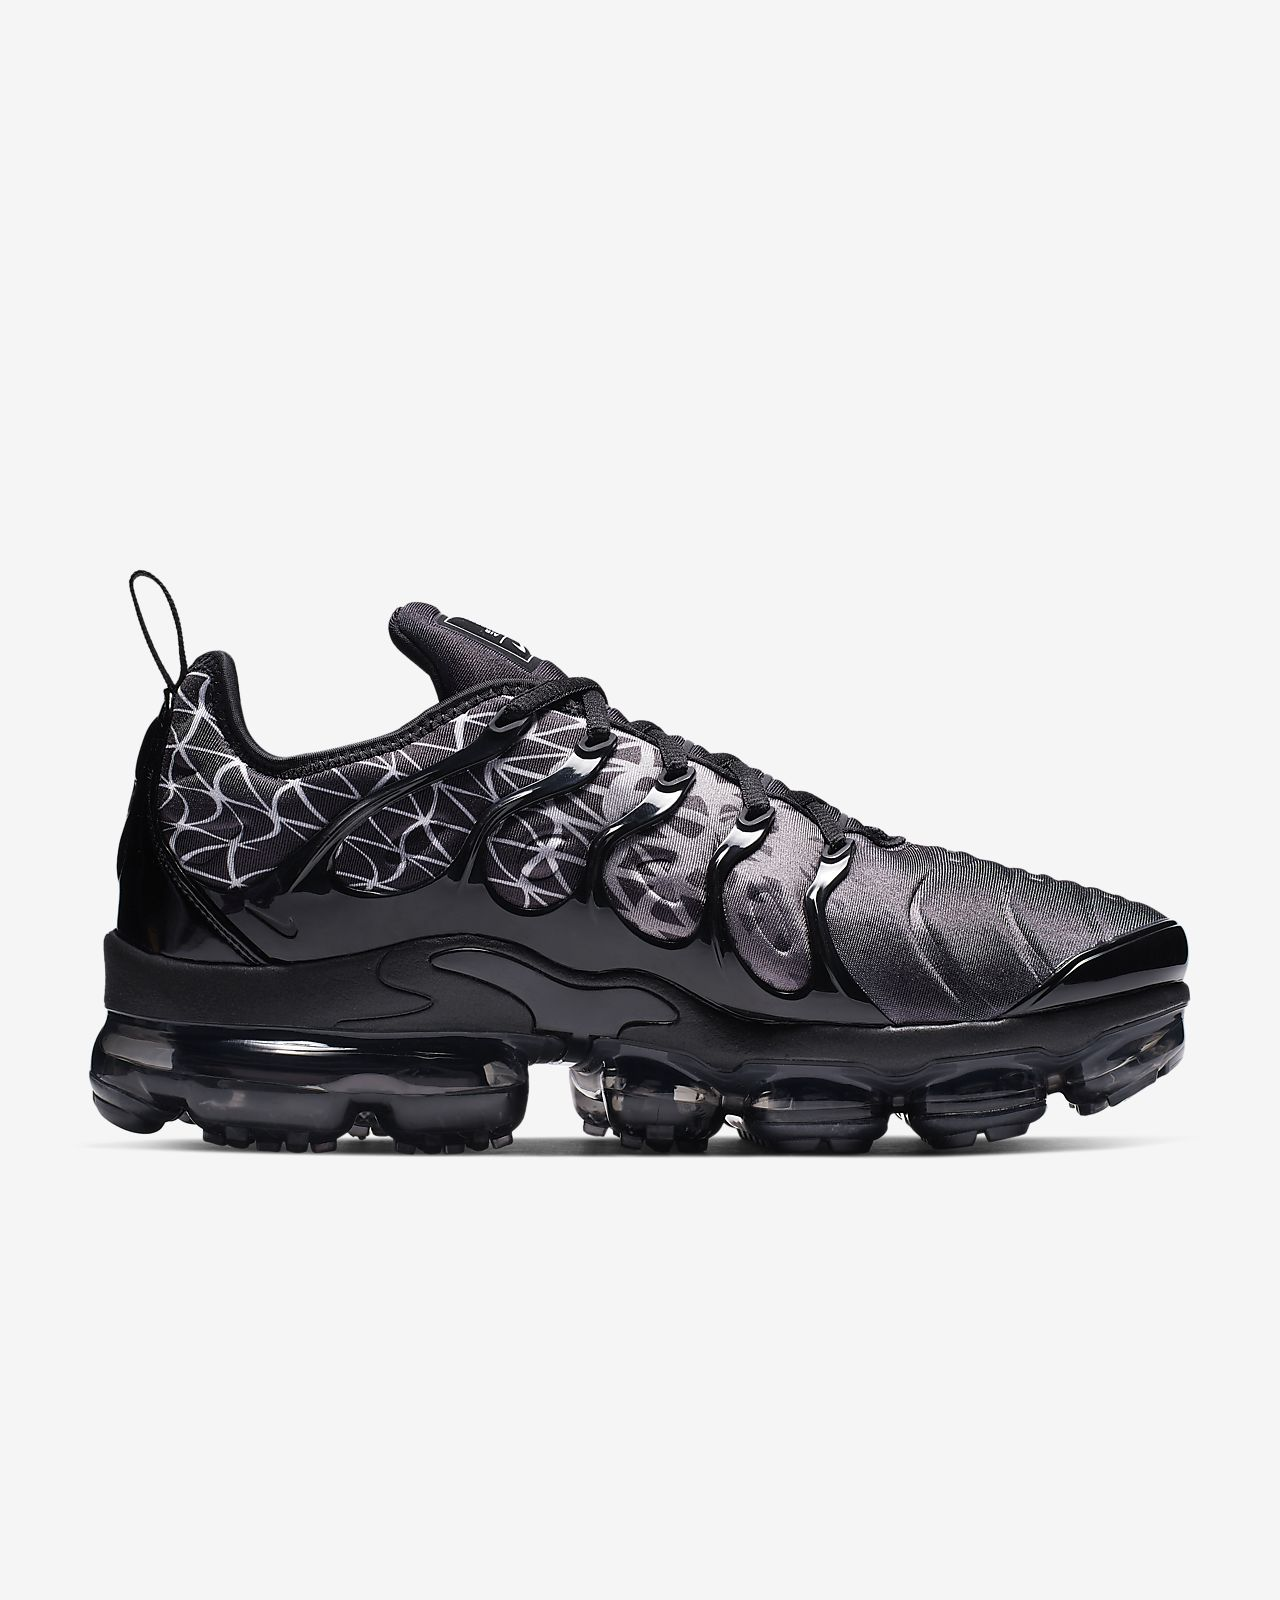 Dernières Chaussures Nike Air Max Thea Premium Leather